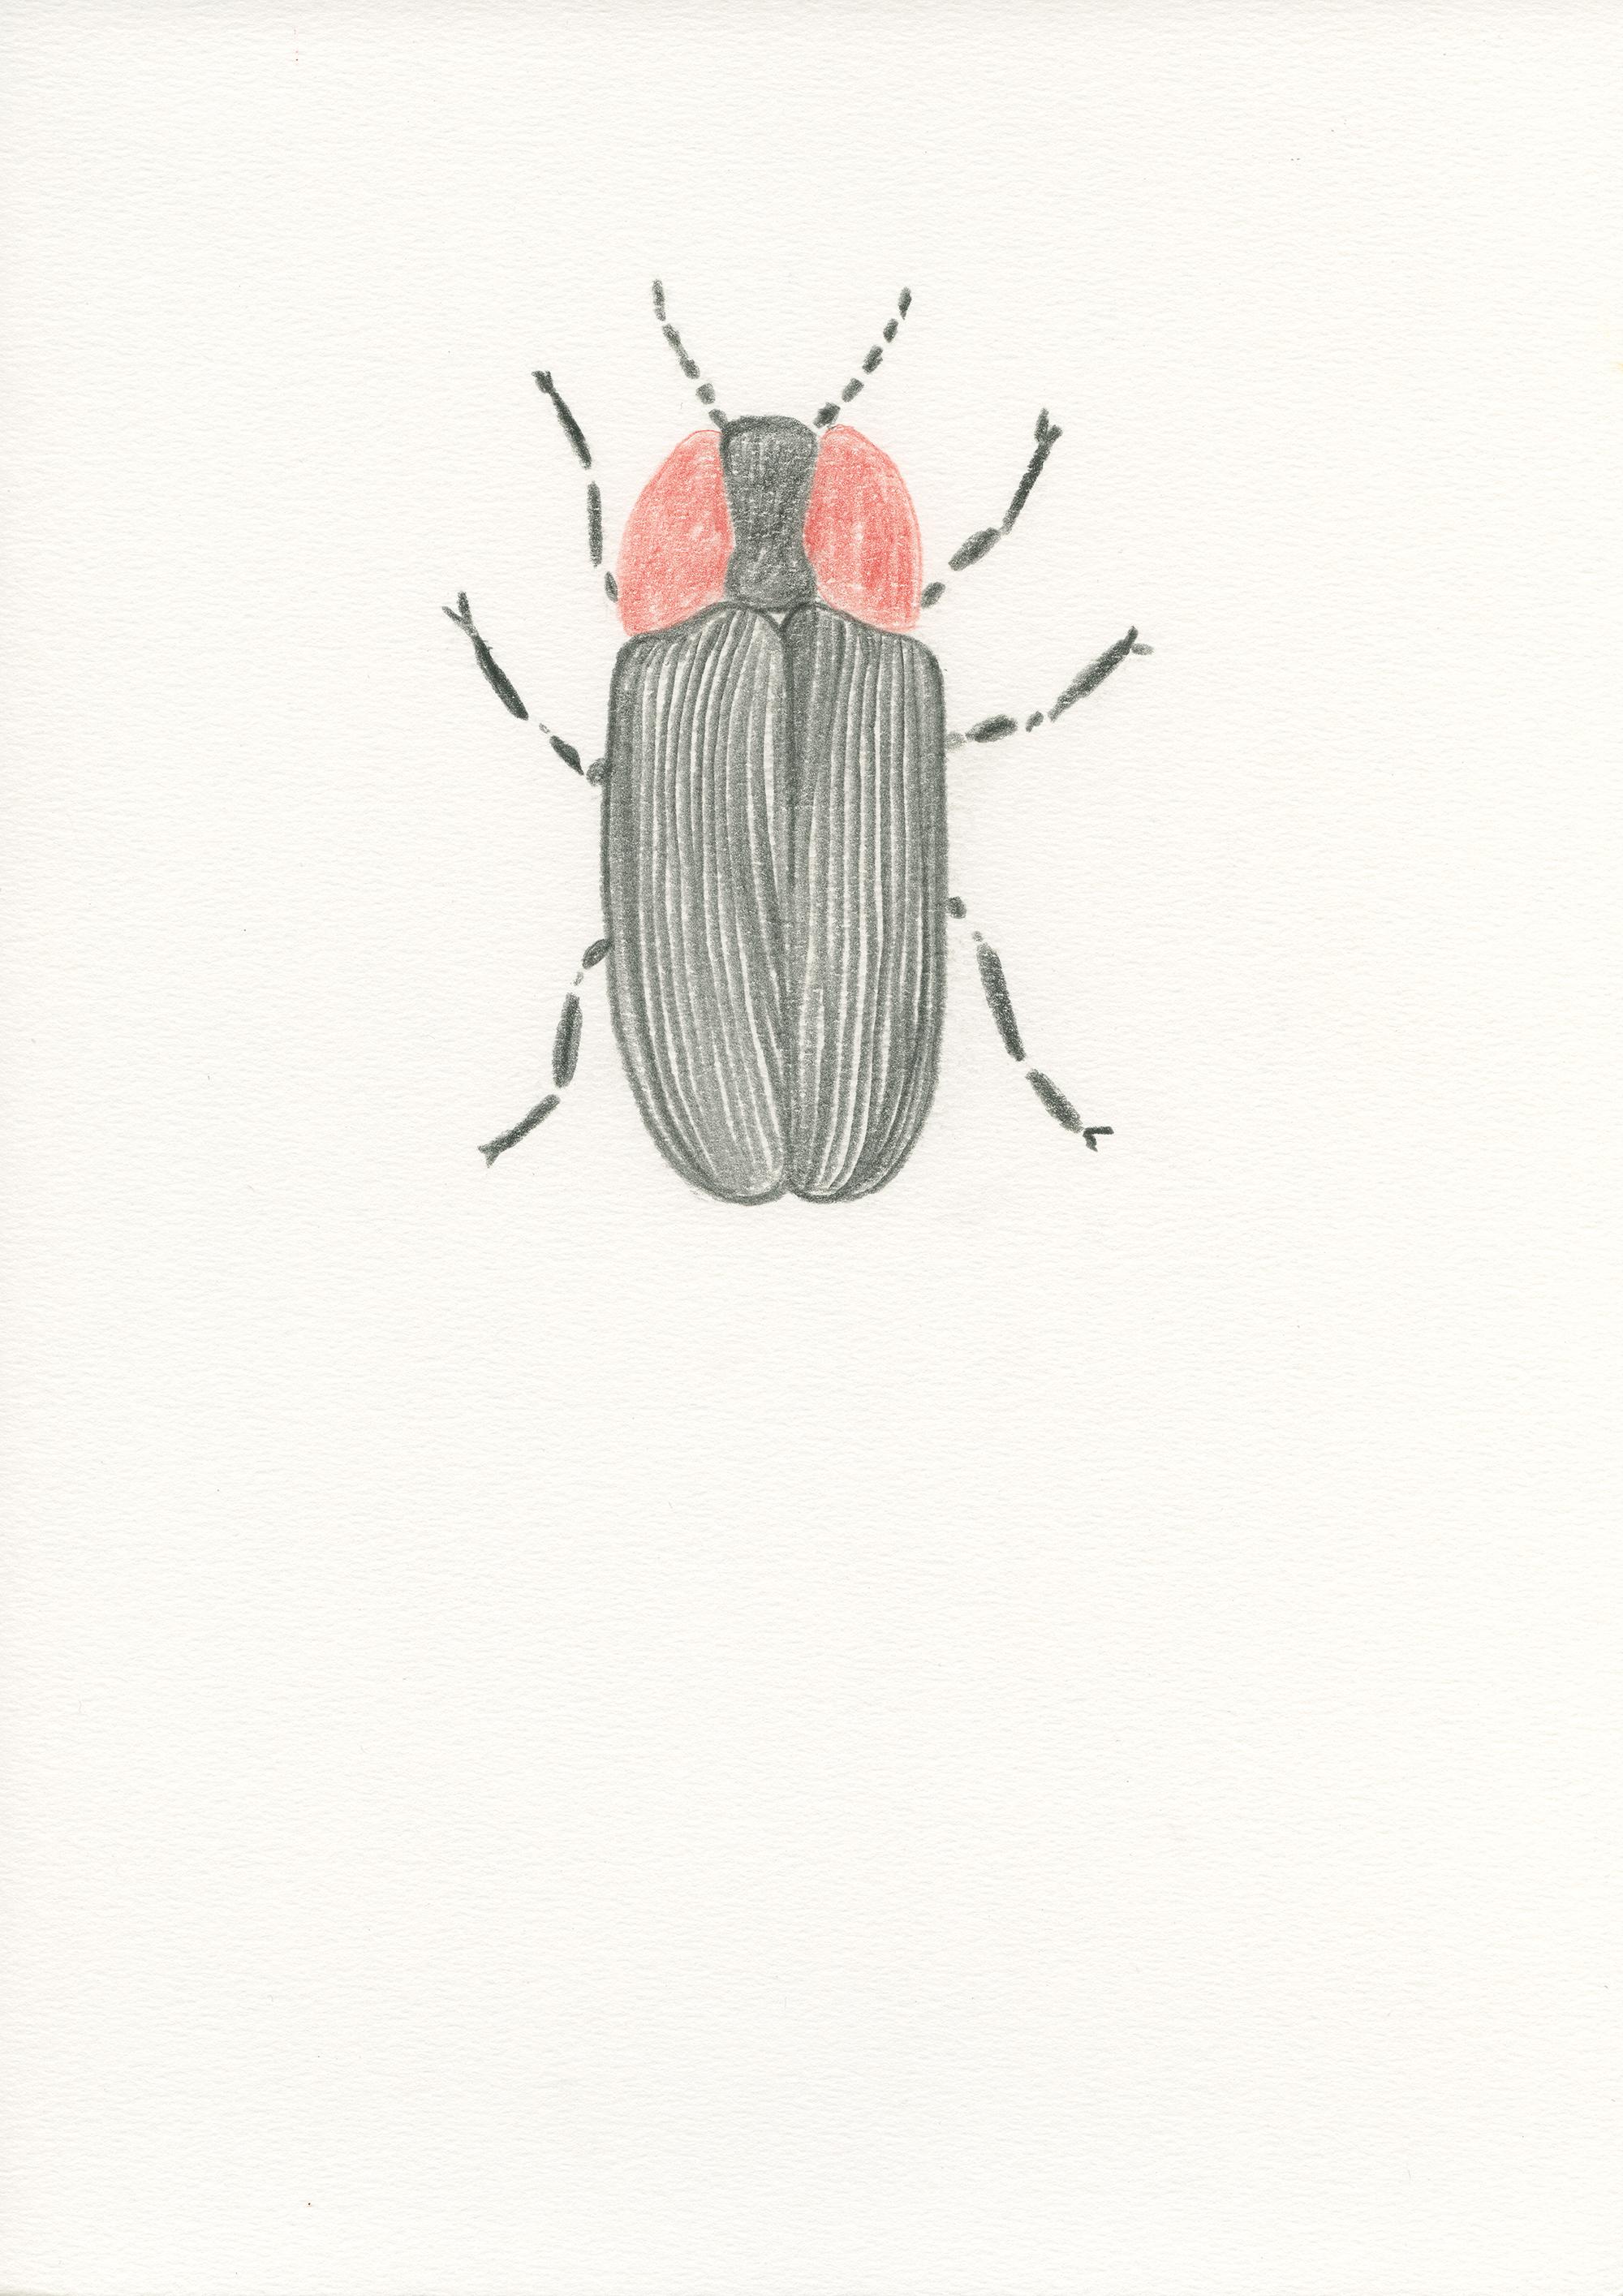 Untitled, 2012, color pencil on paper, 21 x 29,7 cm